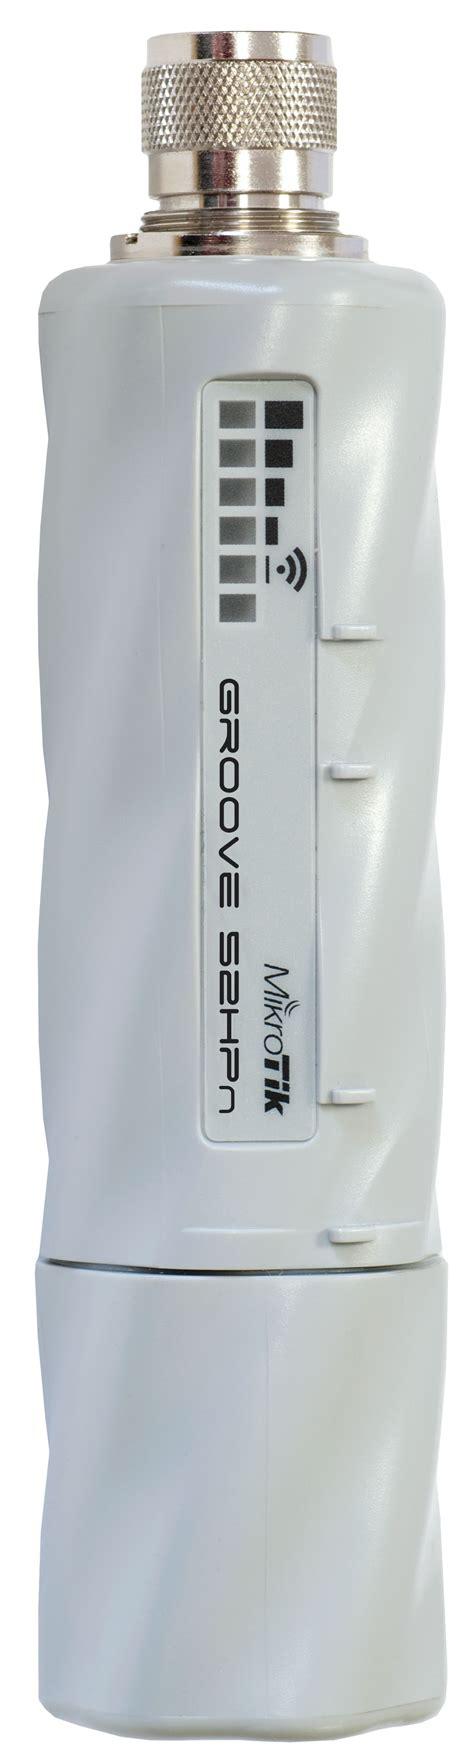 Mikrotik Groovea52hpn Routerboard Lv 4 A 52hpn mikrotik groovea 52hpn 2 4 5ghz outdoor ap wifianten